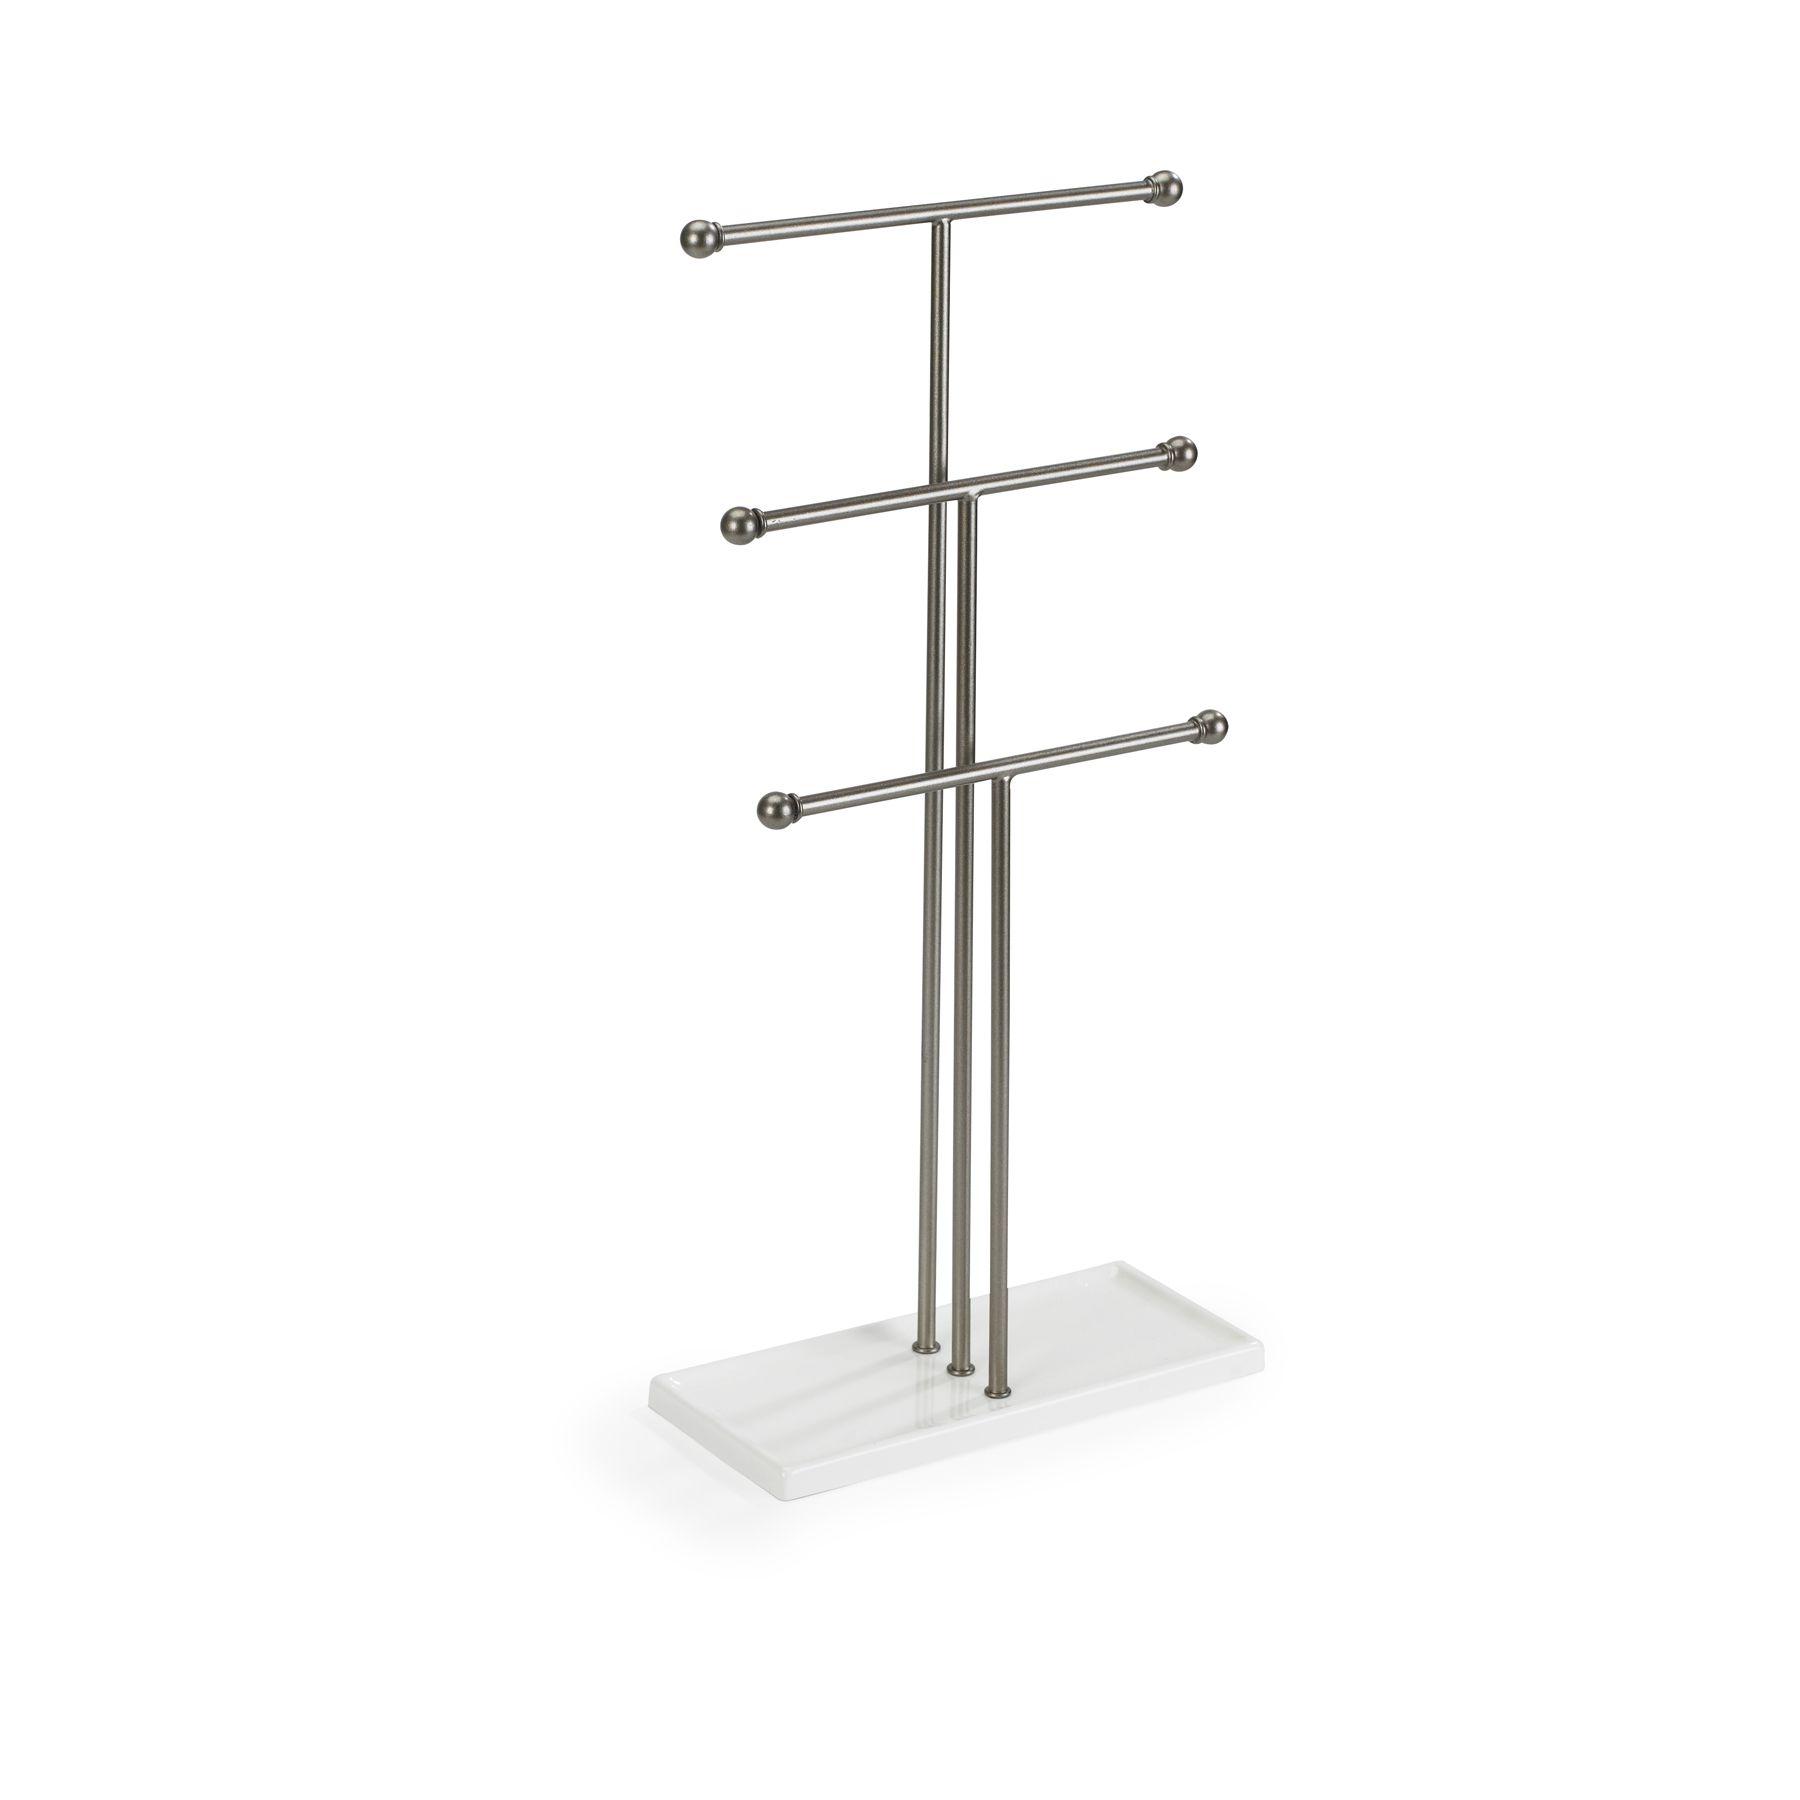 Photo of Trigem Jewelry Stand, White/Nickel